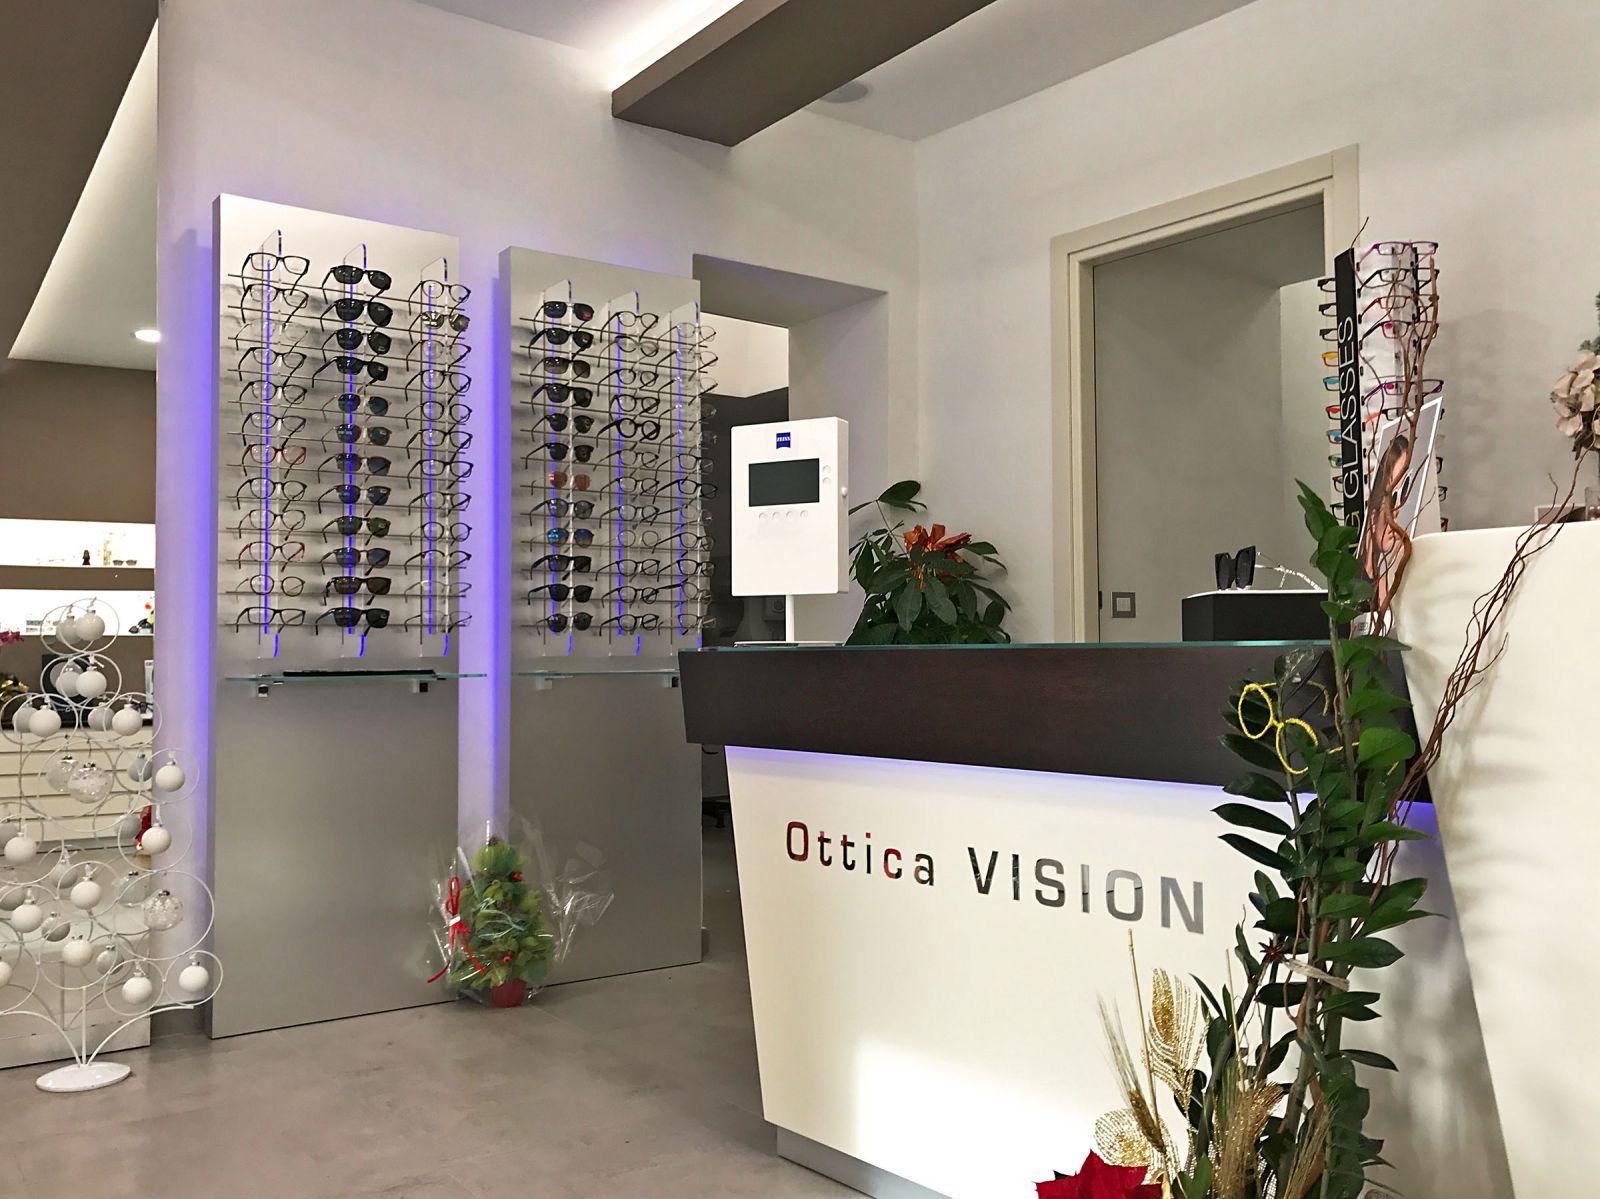 Ottica Vision - 3